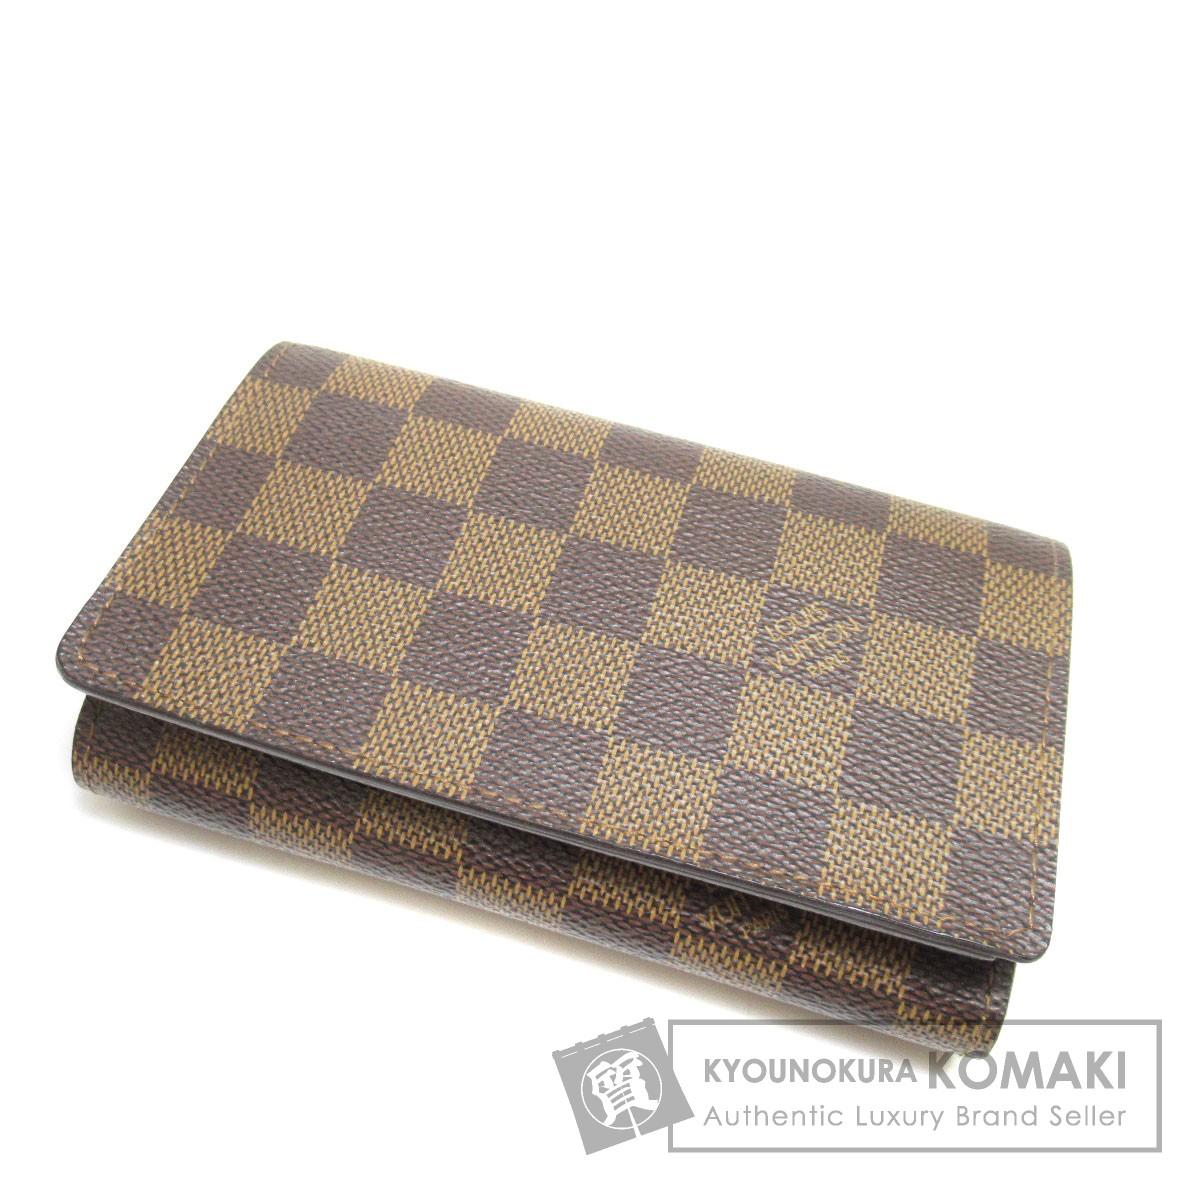 LOUIS VUITTON N61736 ポルト フォイユ トレゾール 二つ折り財布(小銭入れあり) ダミエキャンバス レディース 【中古】【ルイ・ヴィトン】